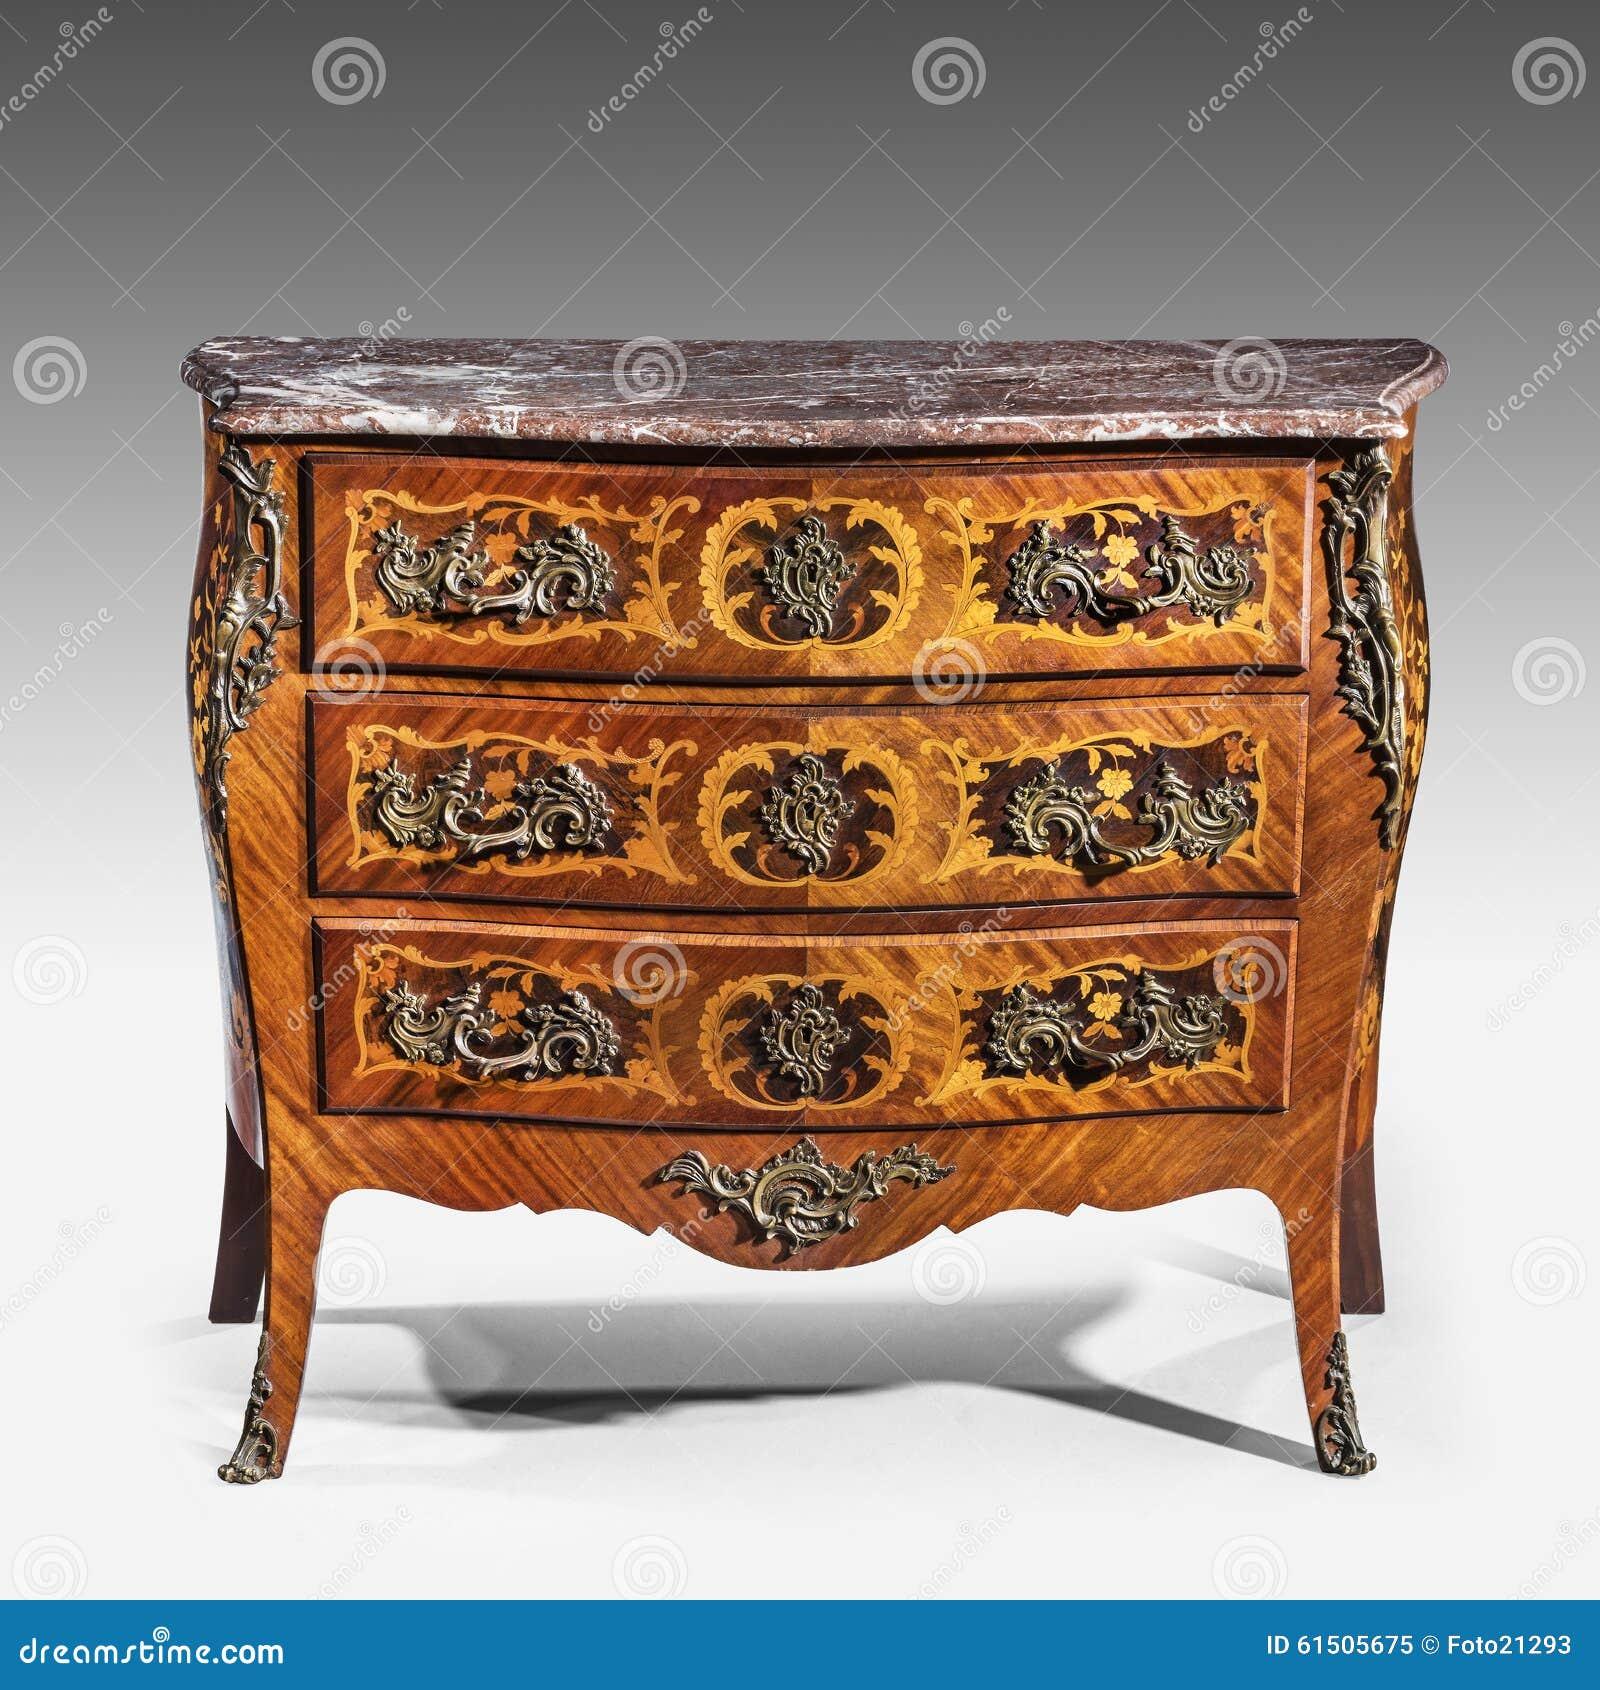 Classic Old Original Elegant Vintage Wooden Chest Of